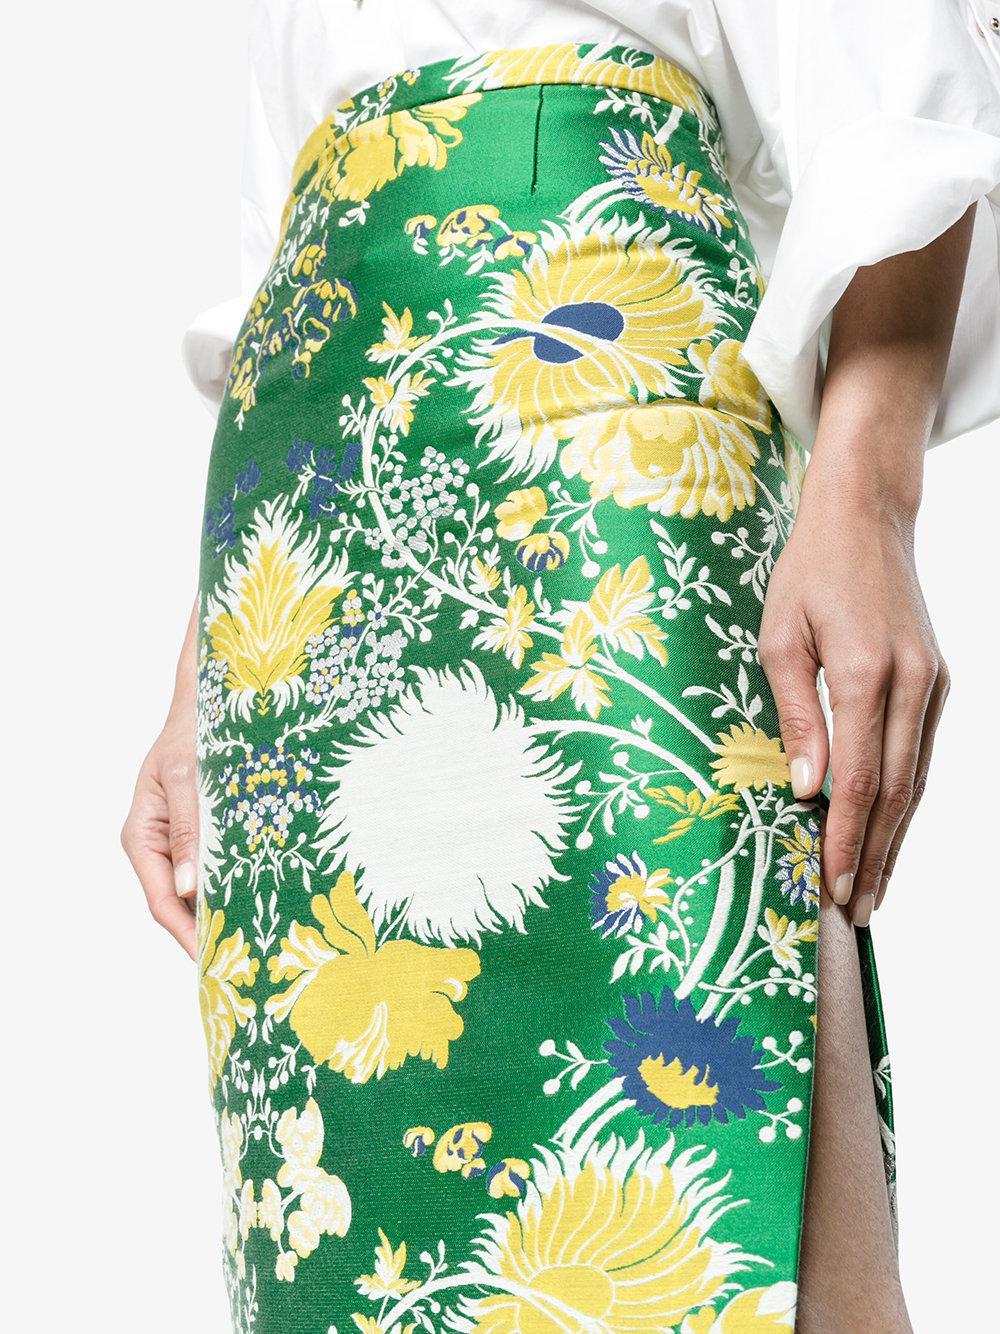 Jacquard Lurex Pencil Skirt - Green Rochas Cheap Sale Exclusive Cheap Price Original Cheap Price Top Quality RTTUT1TPD